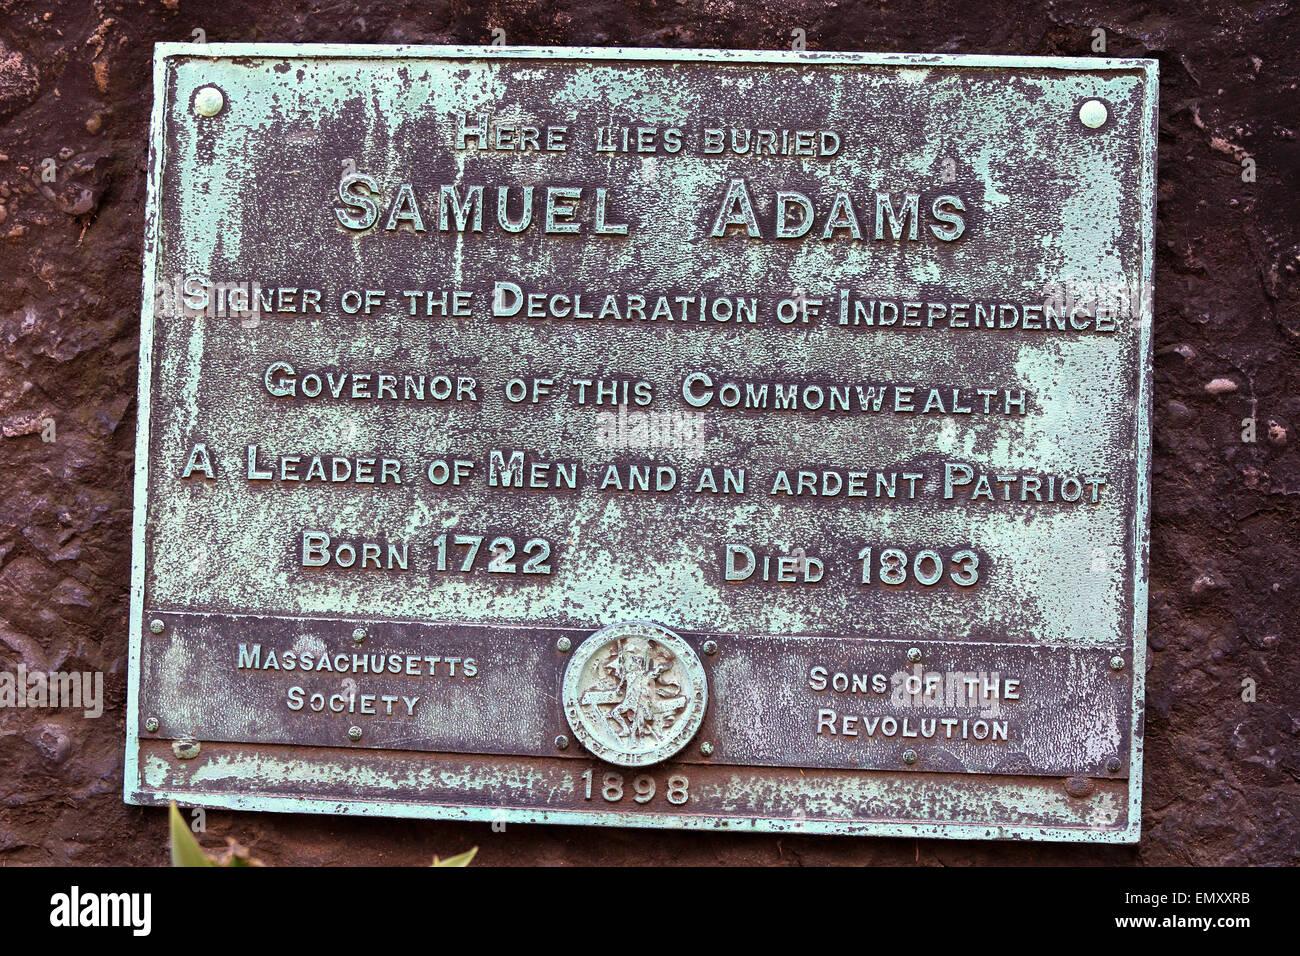 Samuel Adams gravestone marker, Sam Adams. Boston Massachusetts Freedom Trail landmark. - Stock Image